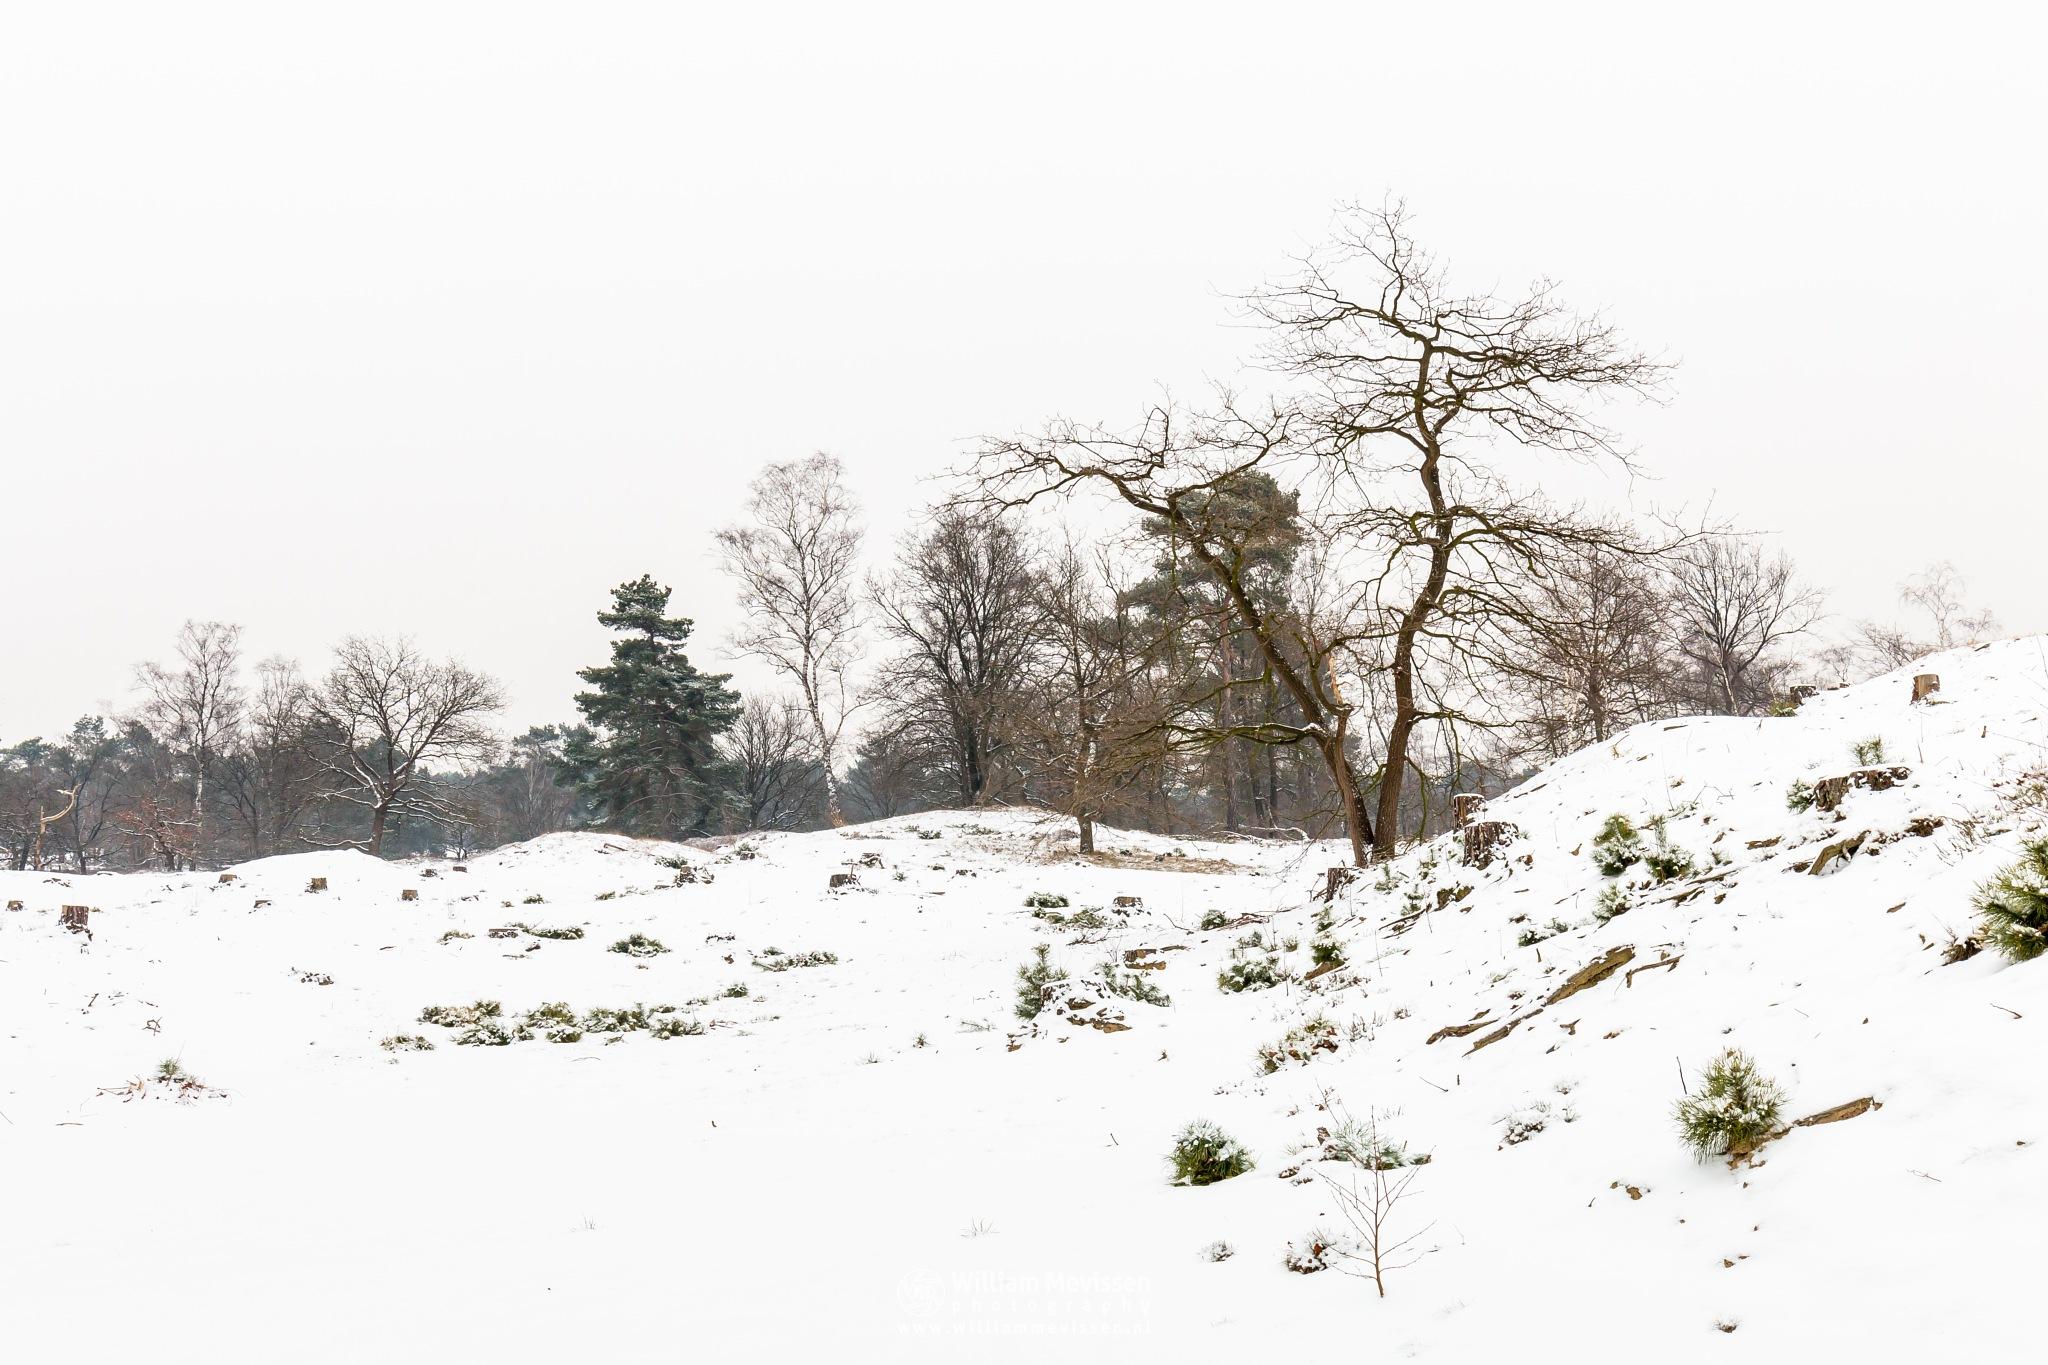 Snow Dunes by William Mevissen